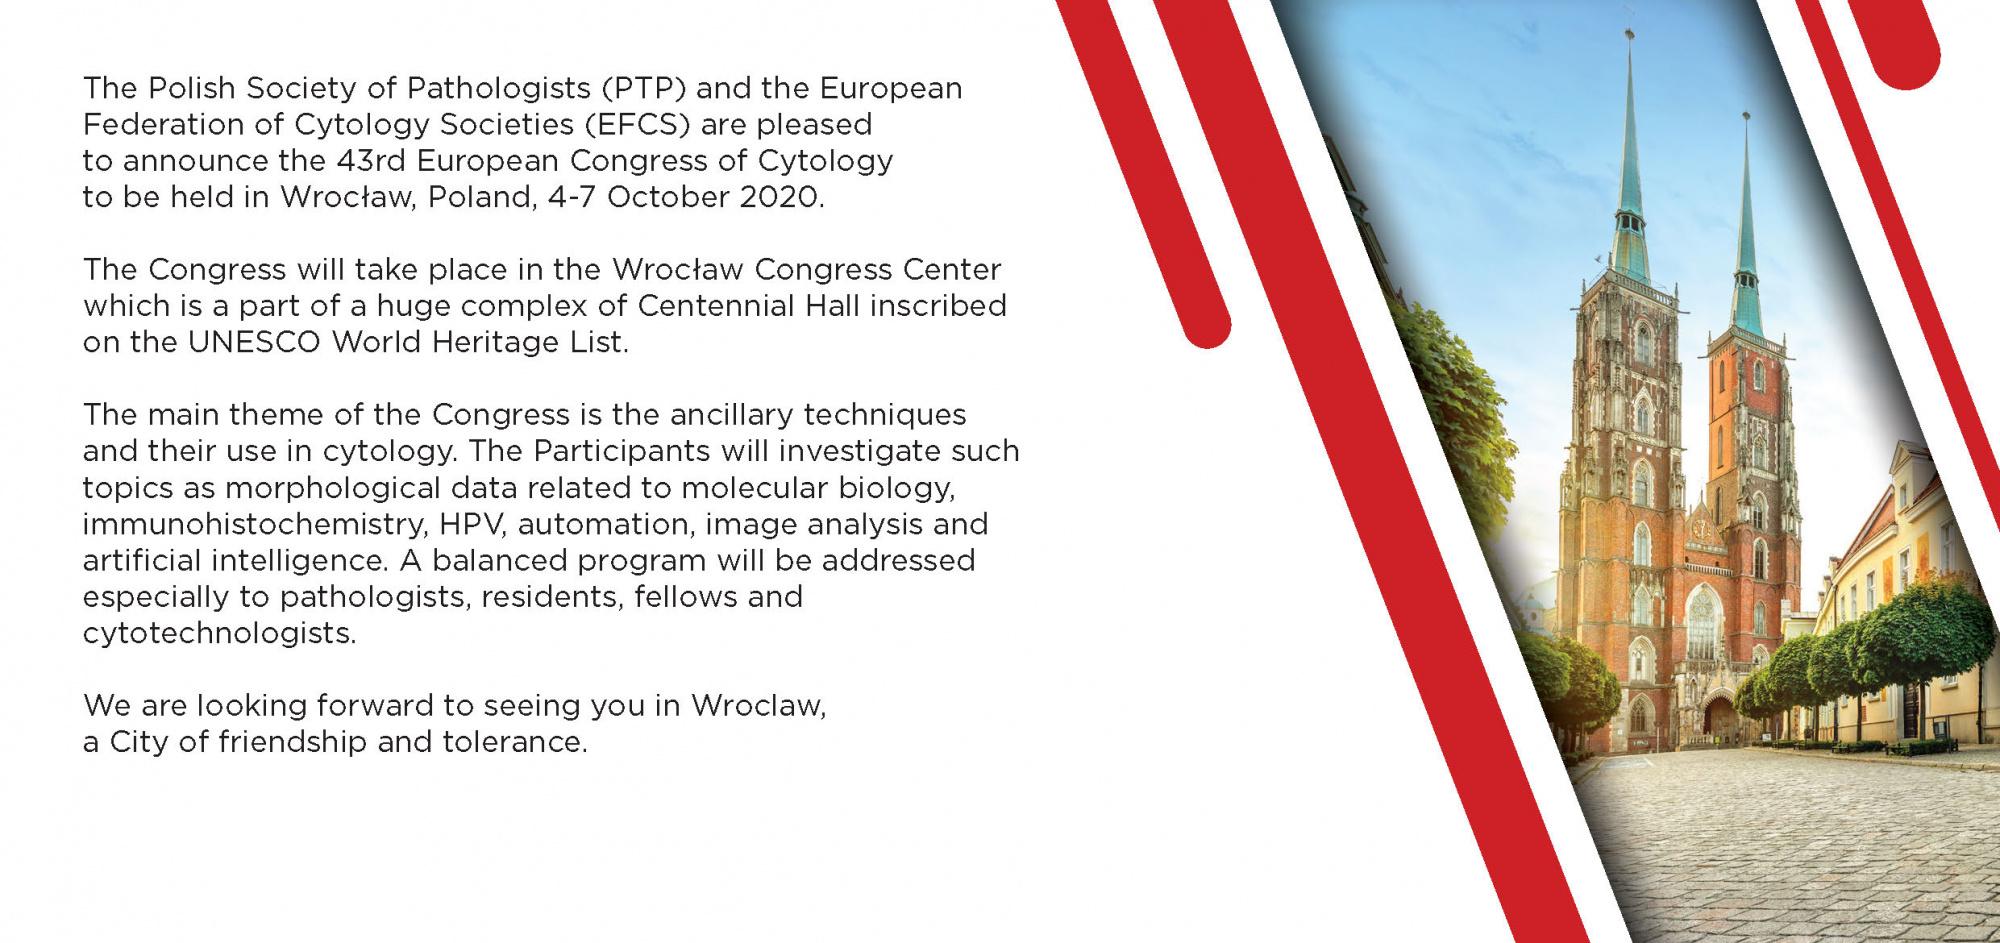 Ecc Calendar.Ecc 2020 Events The Belgian Society Of Pathology